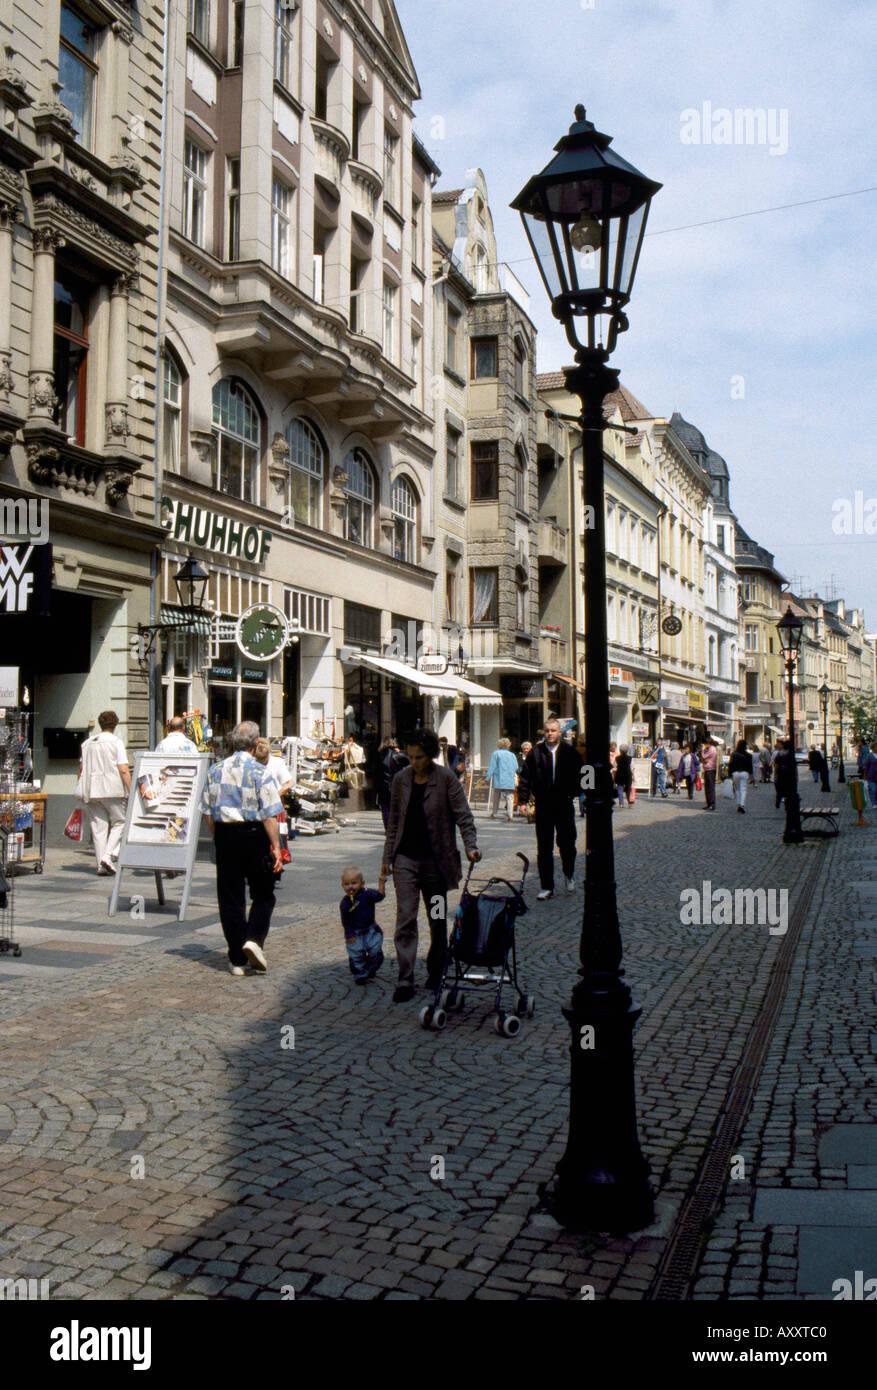 Zwickau, Fußgängerzone Stockbild